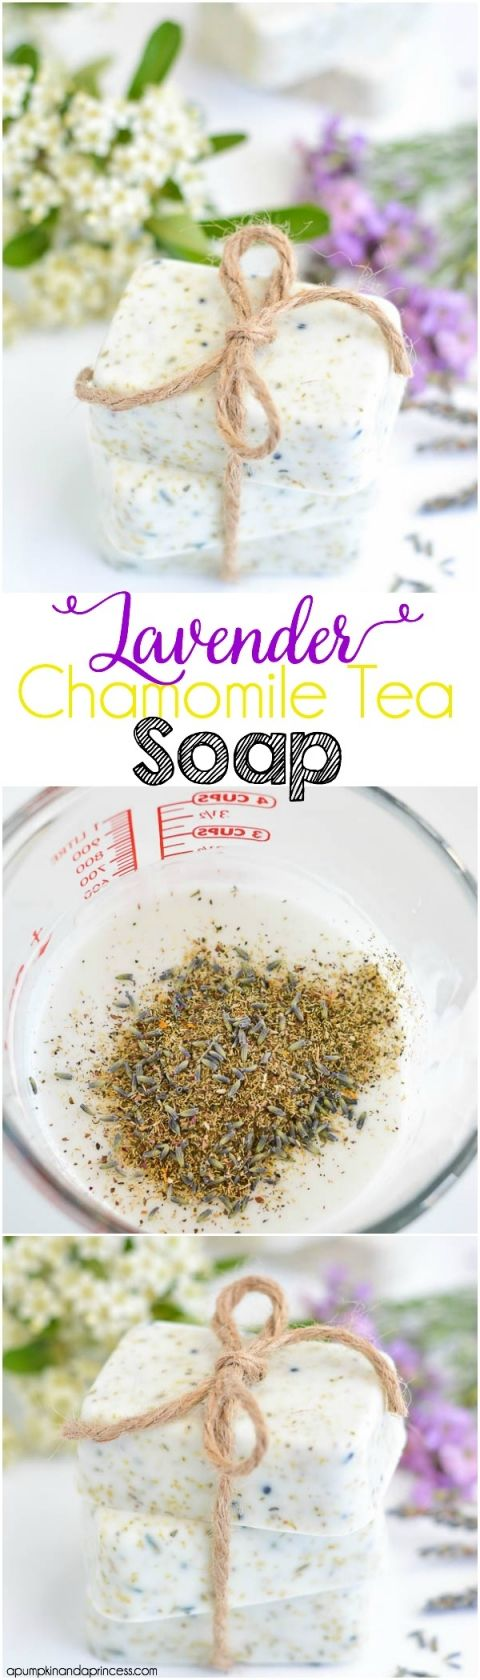 DIY Lavender Chamomile Tea Soap #luxury #forless